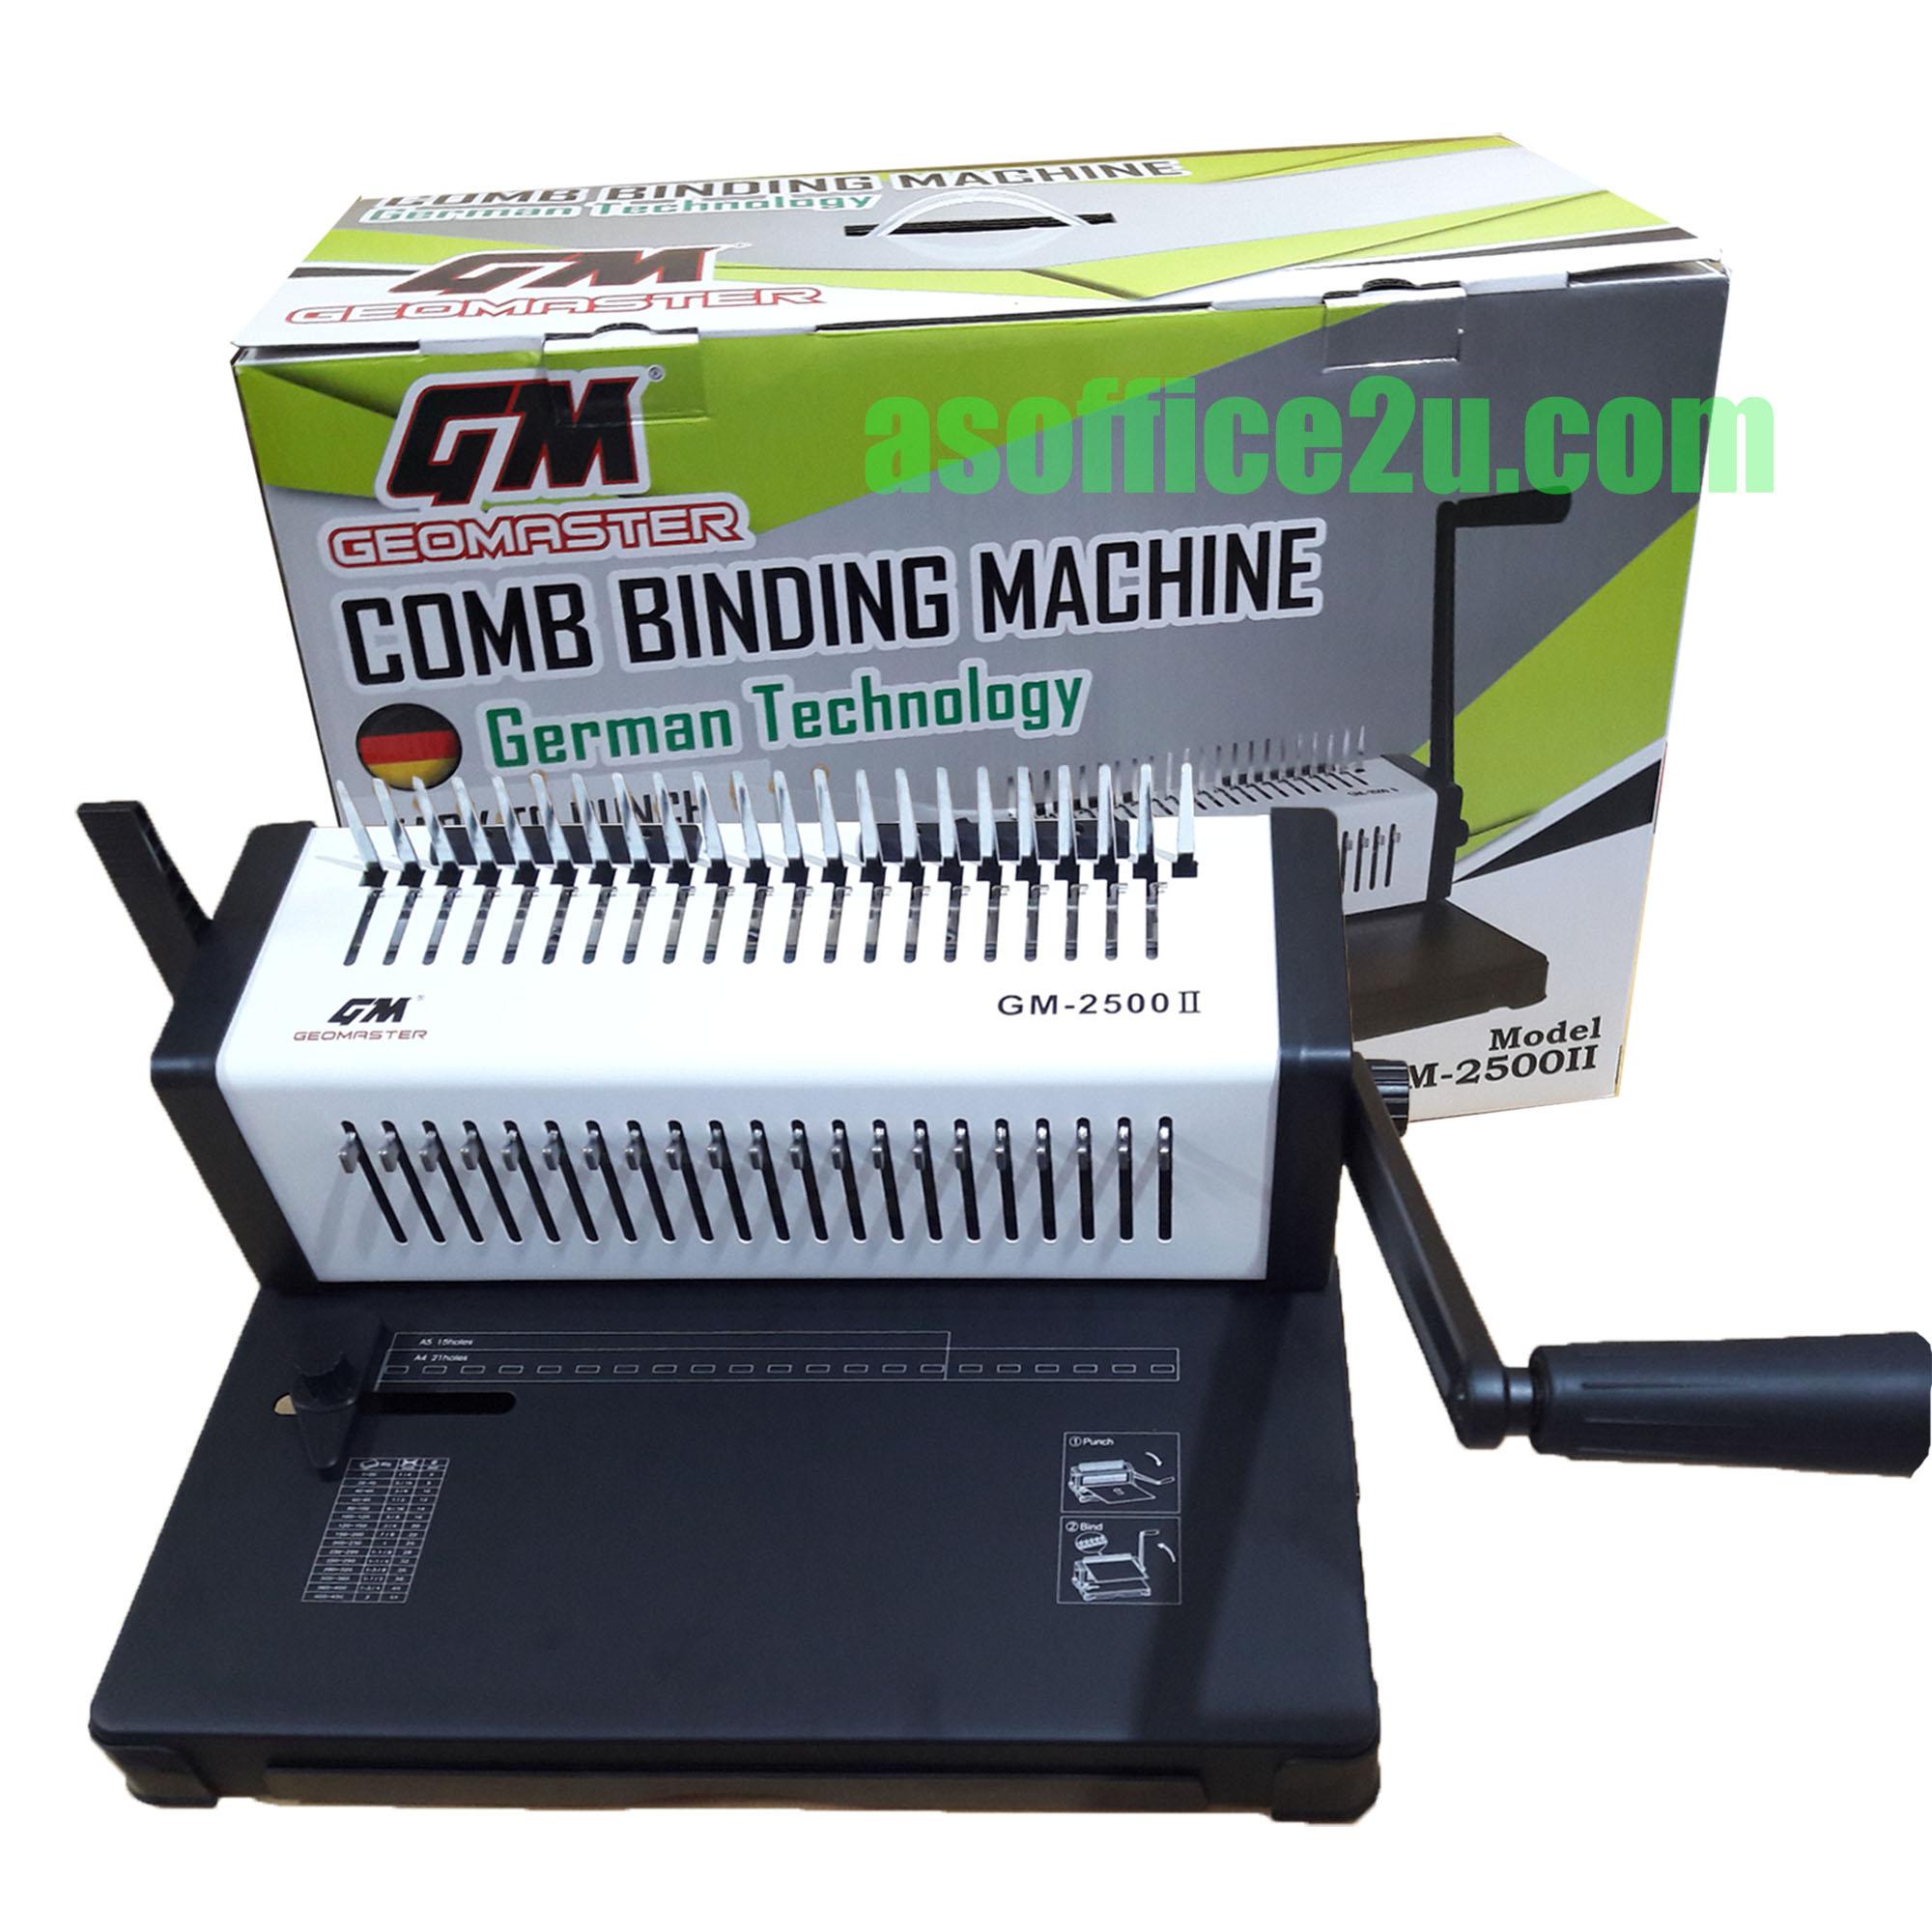 GEOMASTER GM-2500 COMB BINDING MACHINE II